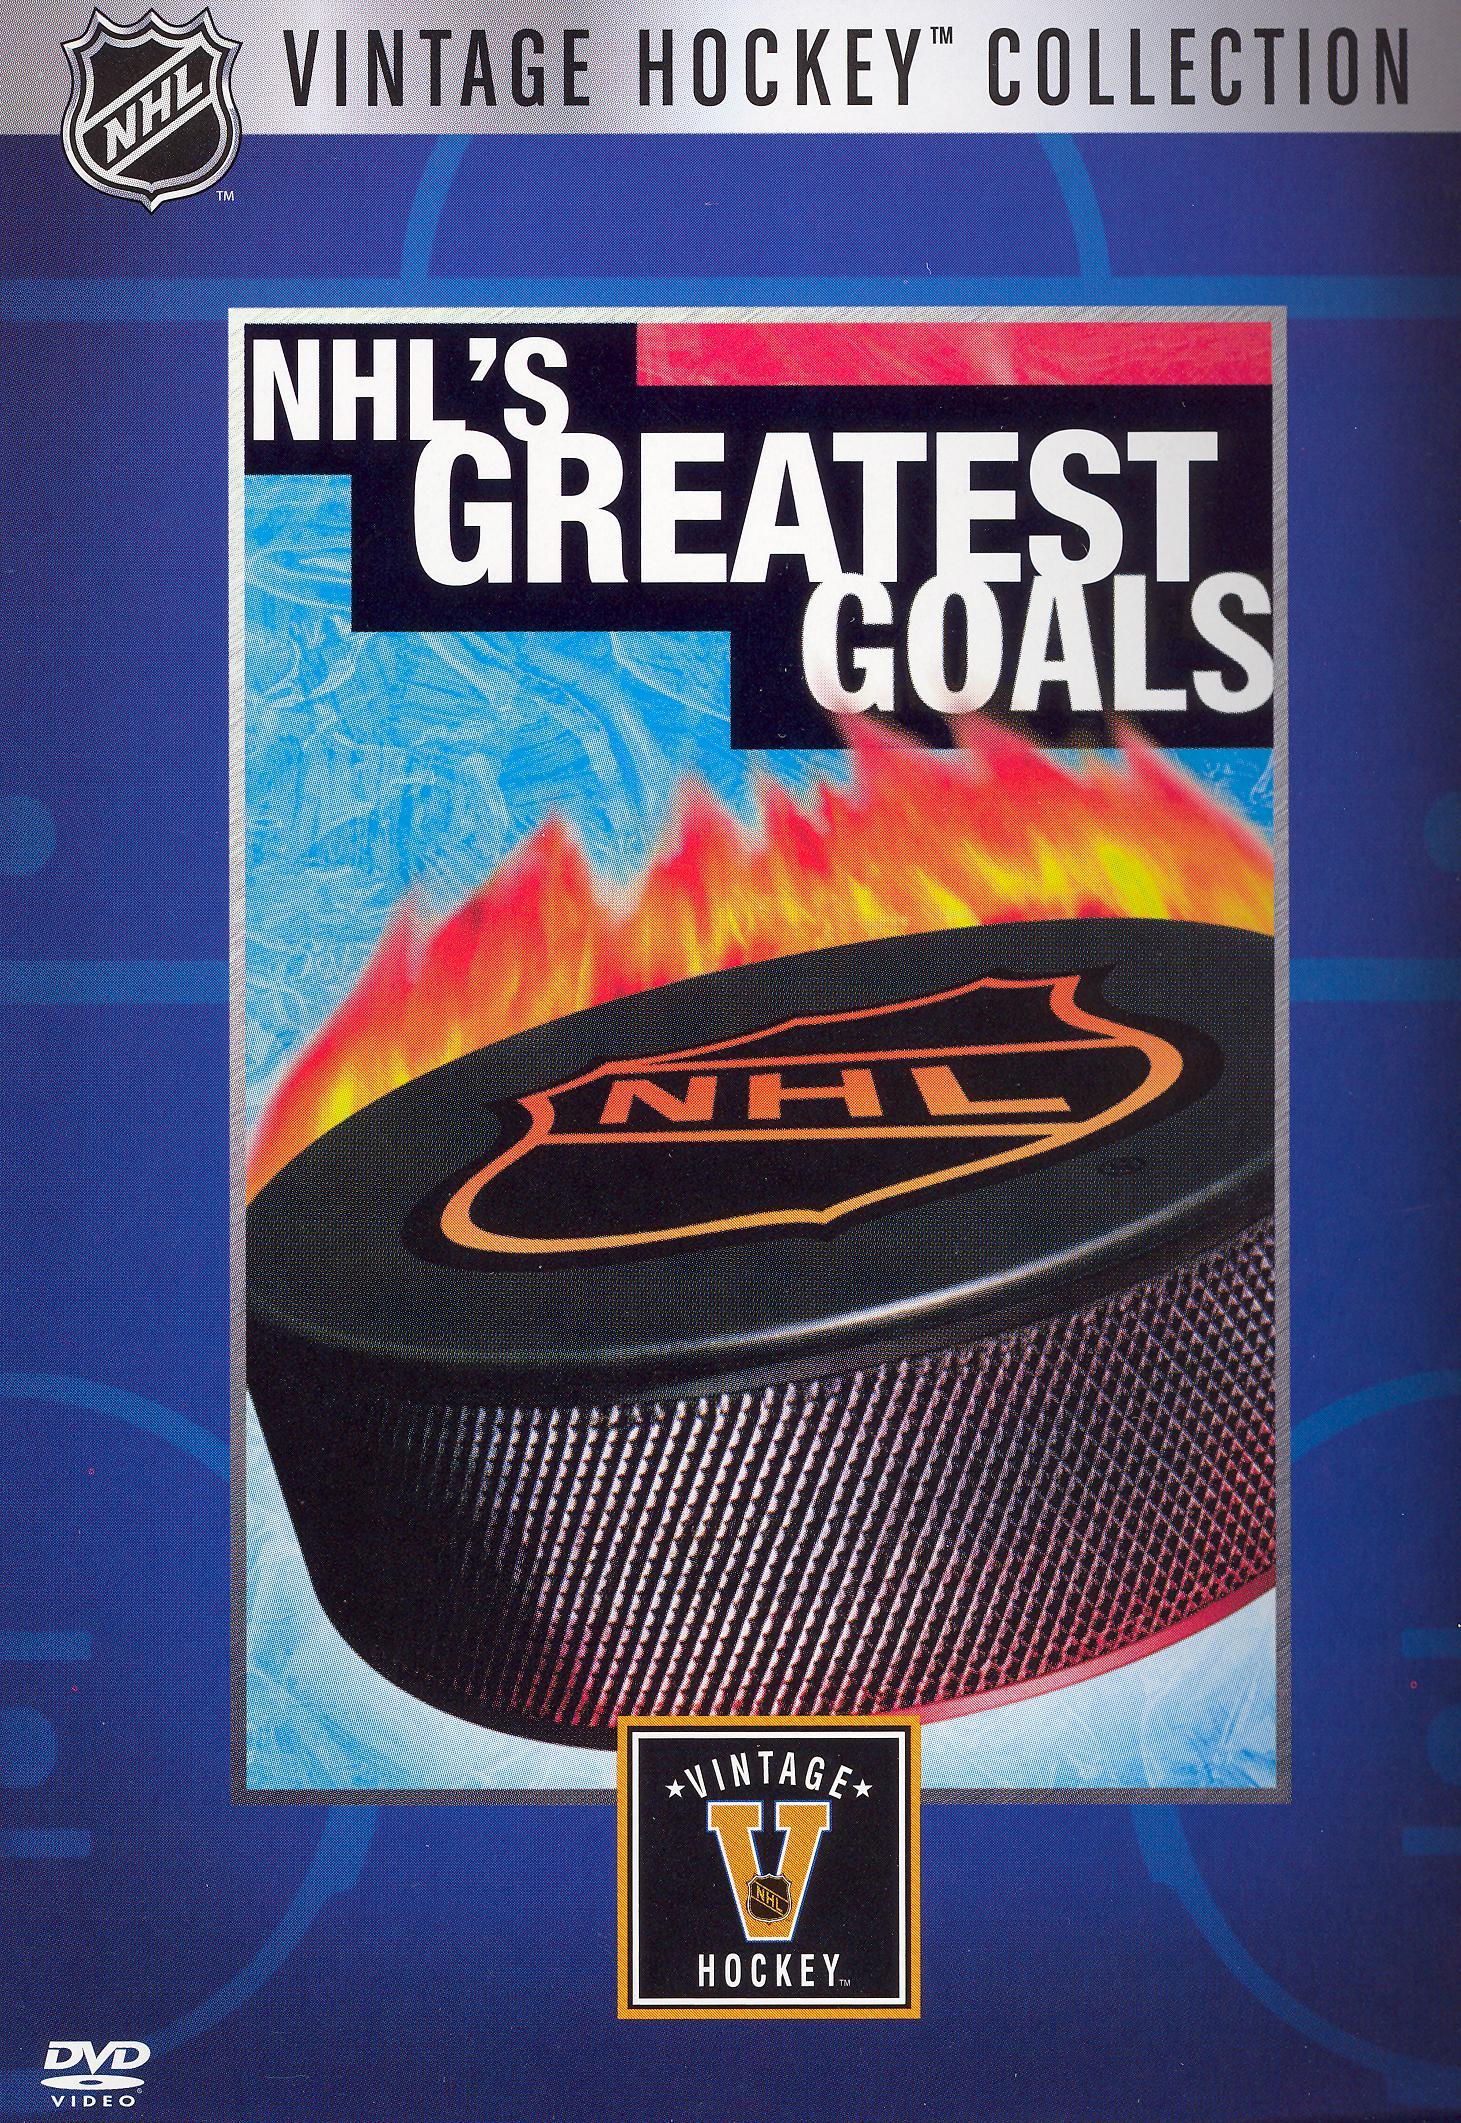 NHL Vintage Collection: Greatest Goals